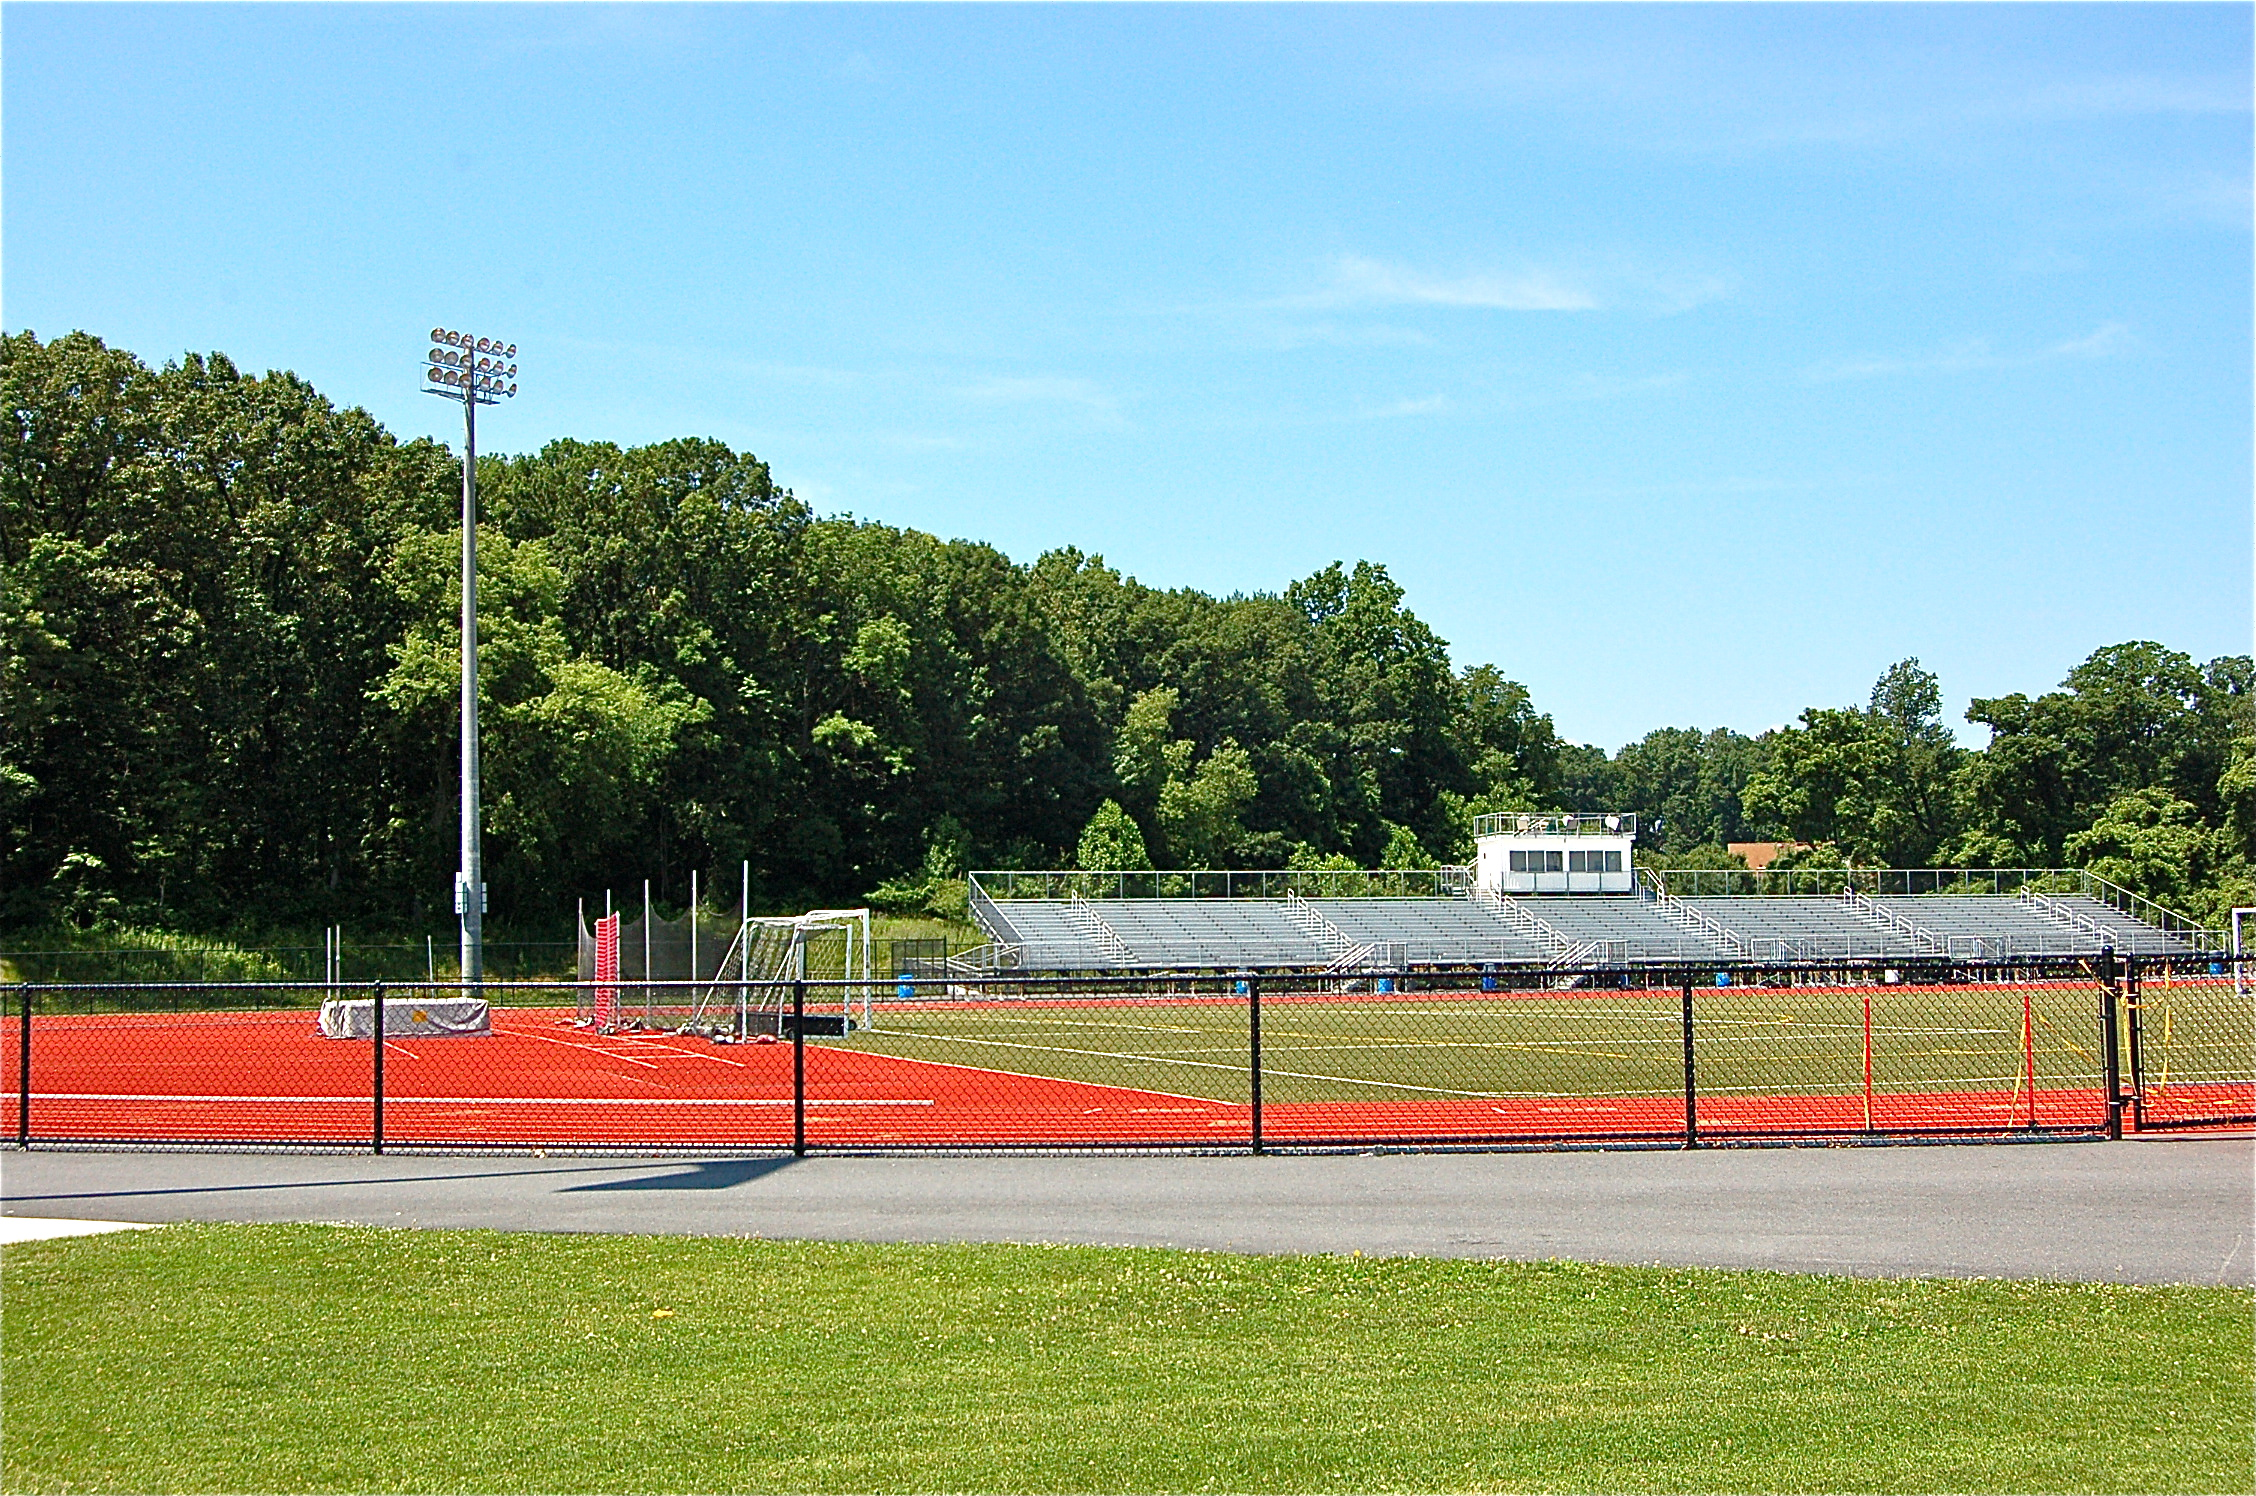 Whitehall High School Stadium, Whitehall-Coplay School District